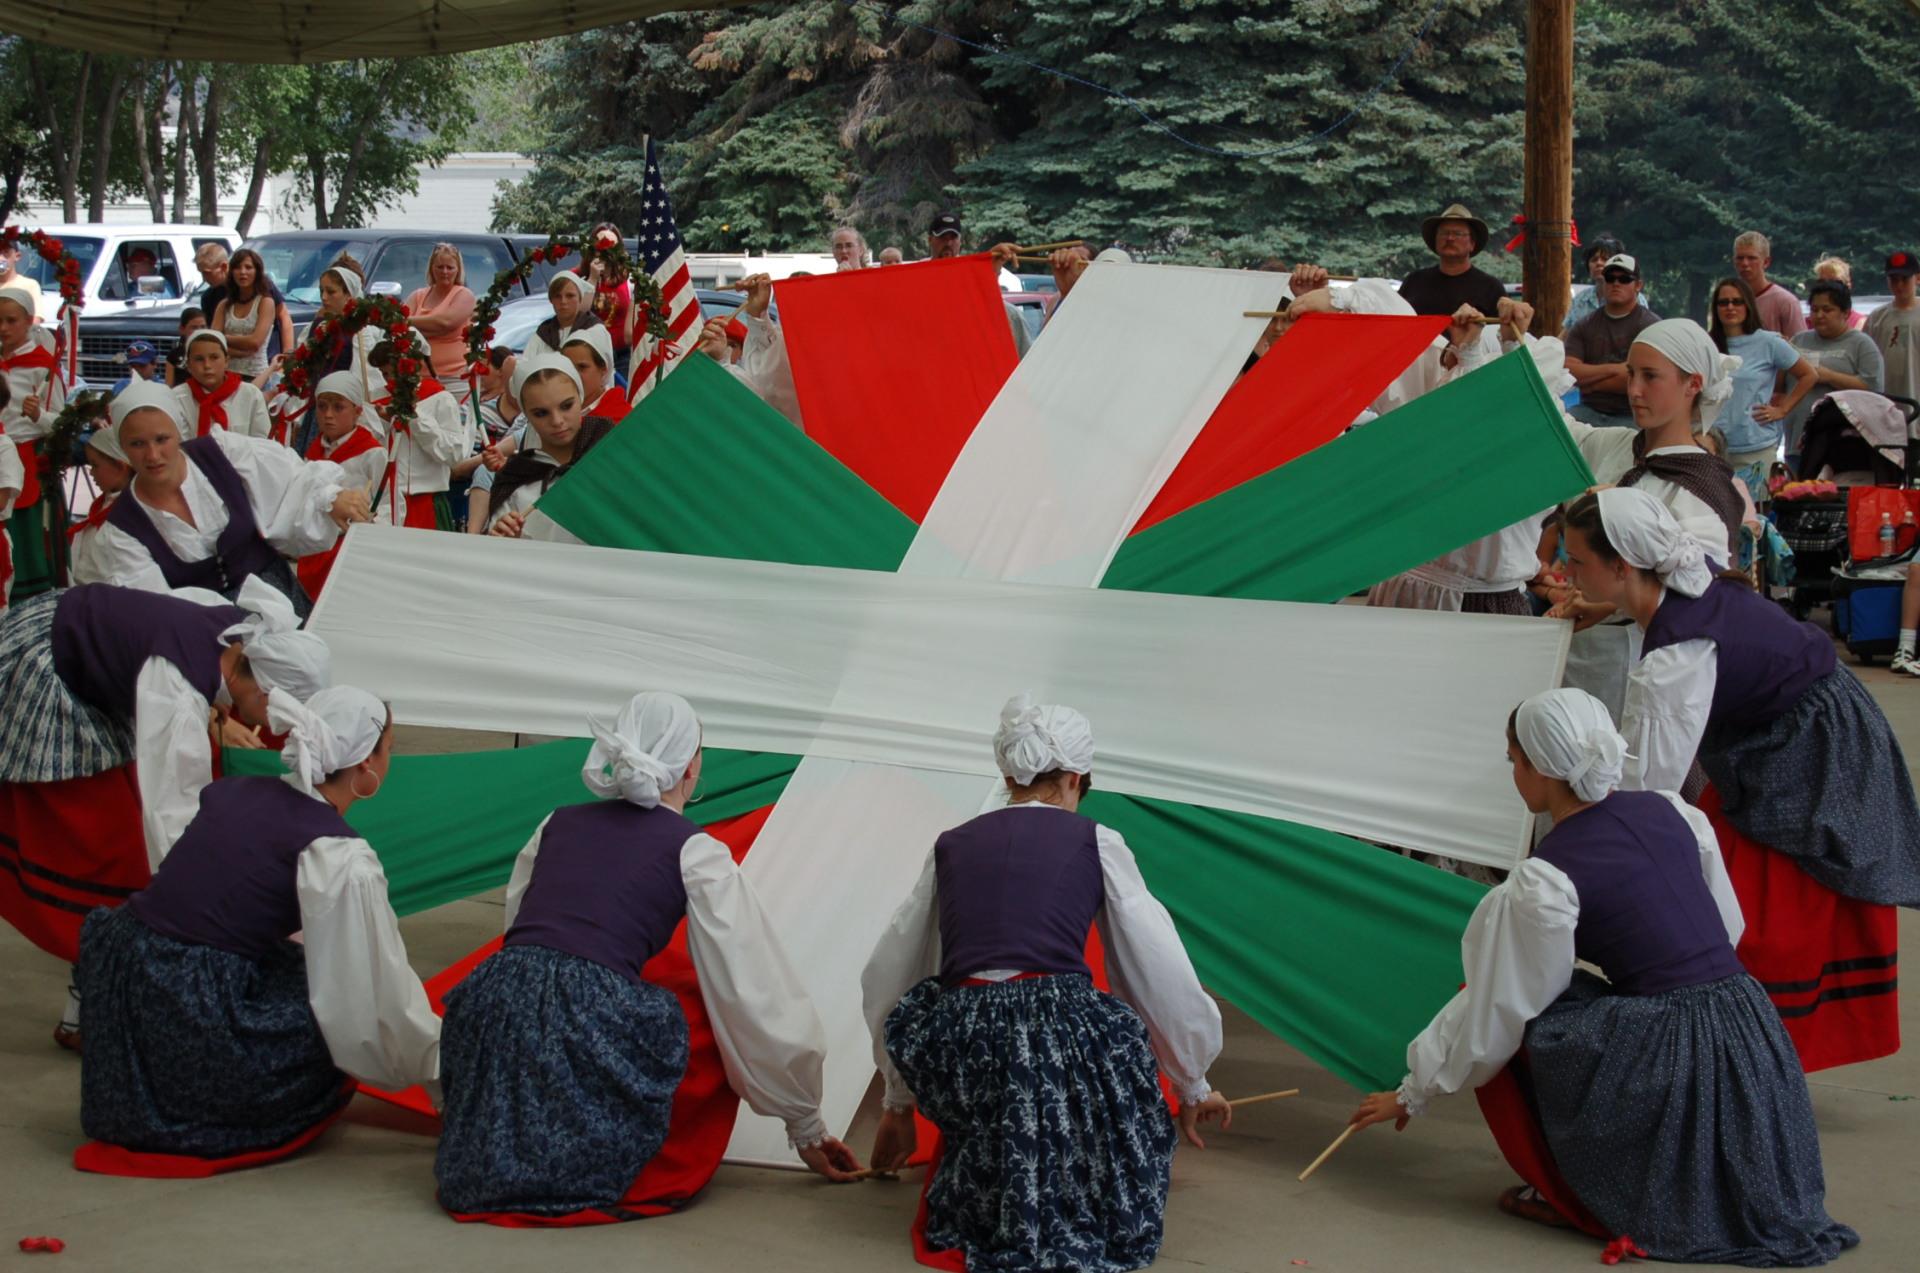 The Ikurriña Dance